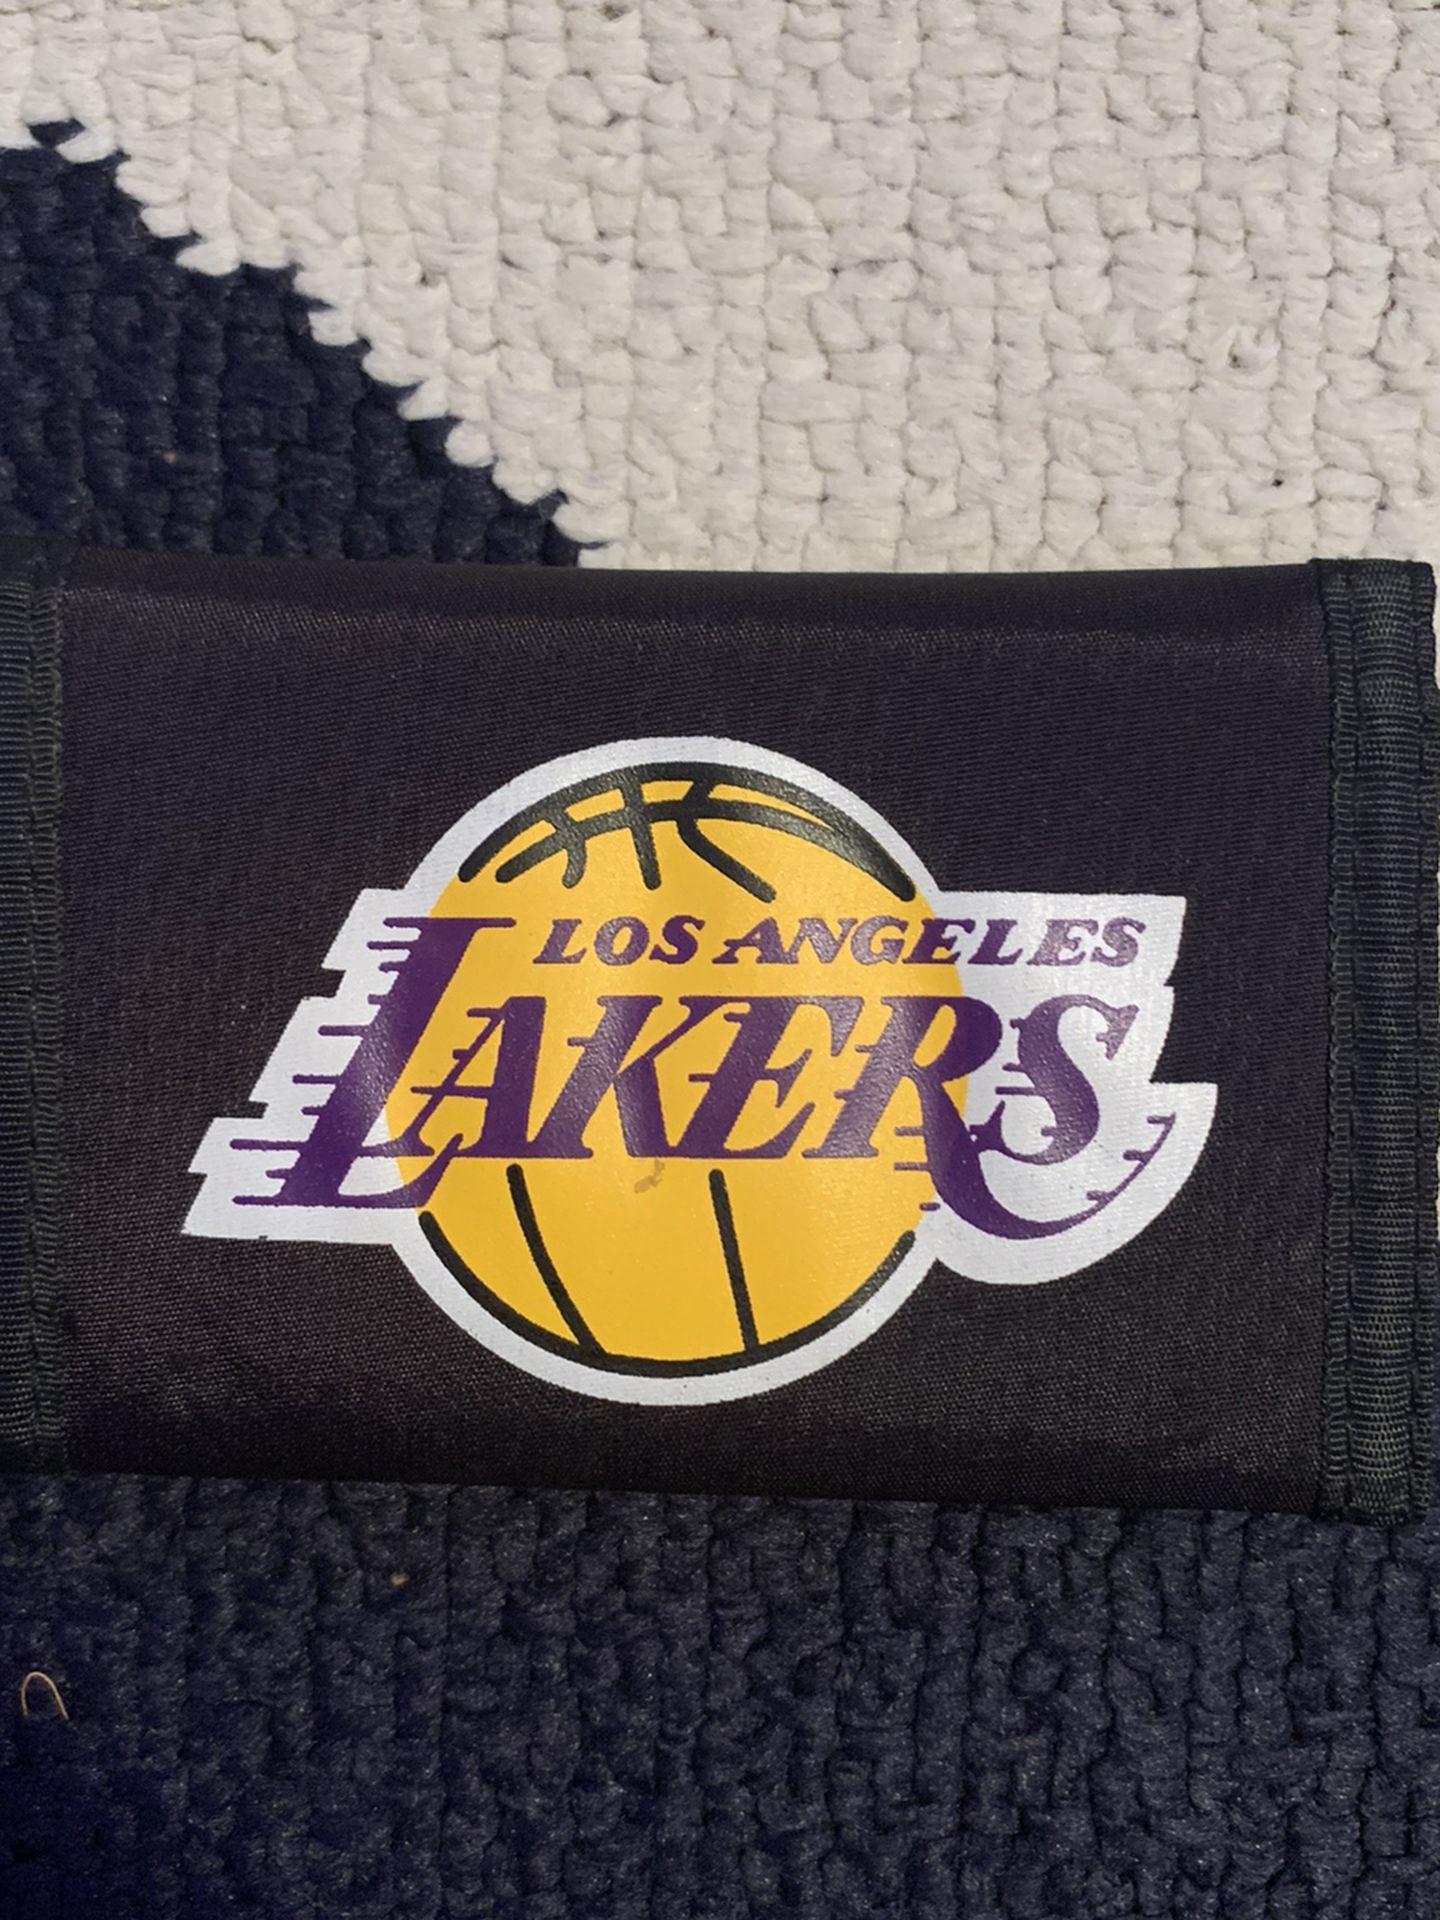 Lakers Wallet